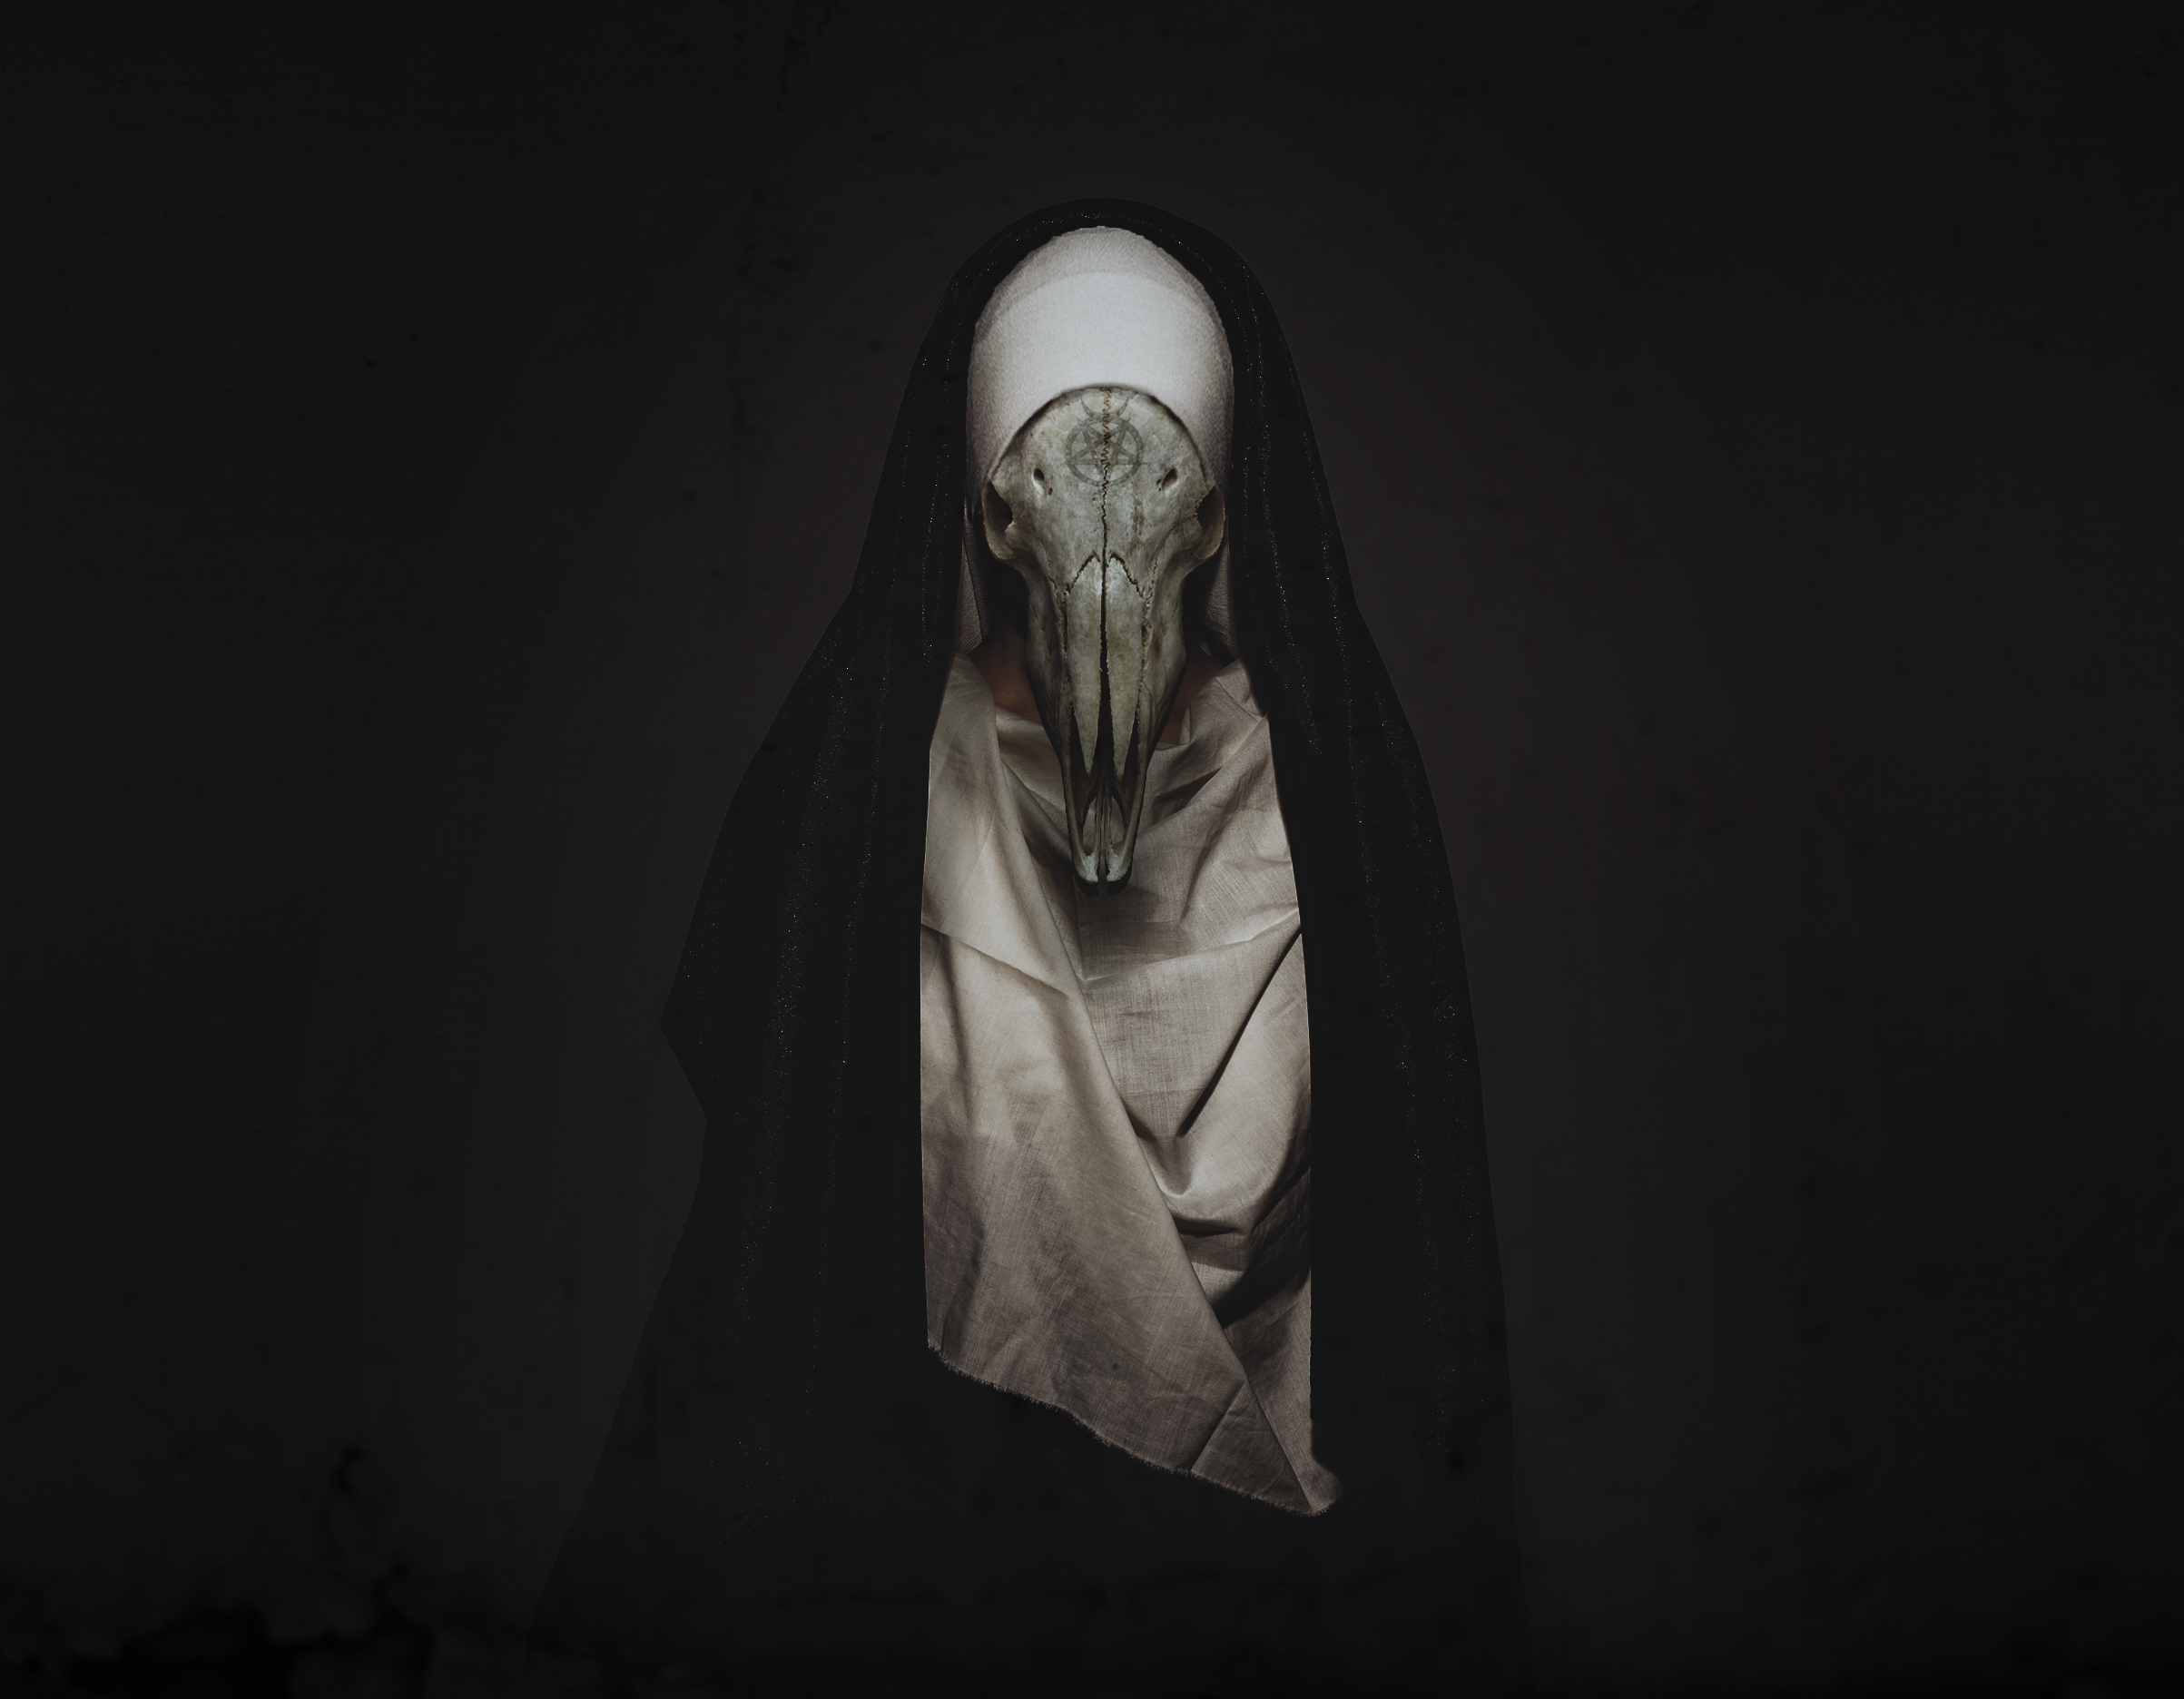 Nun by Vackertmorkt